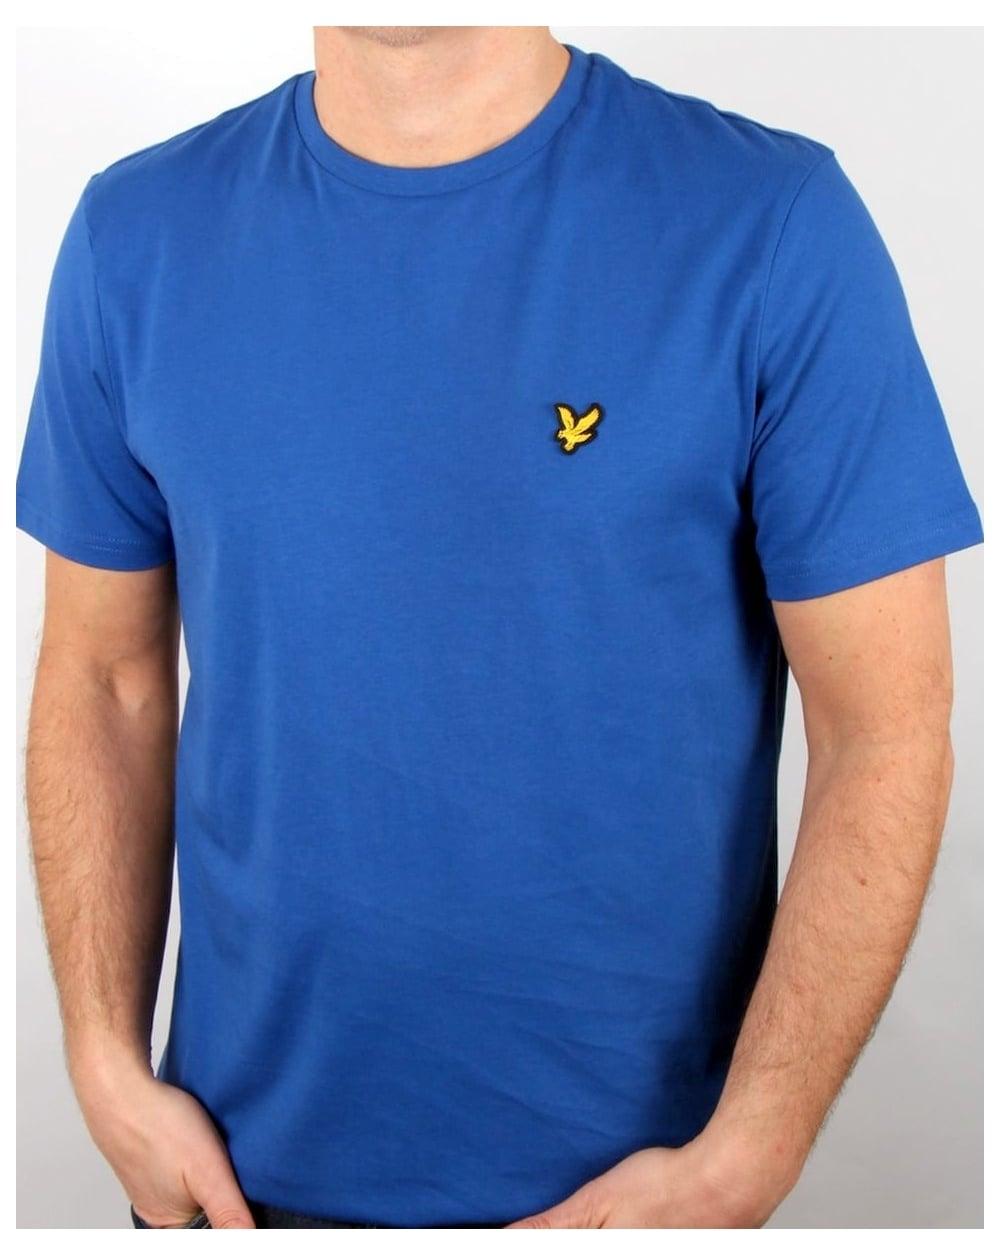 Lyle and scott t shirt true blue men 39 s tee round neck for Lyle and scott shirt sale